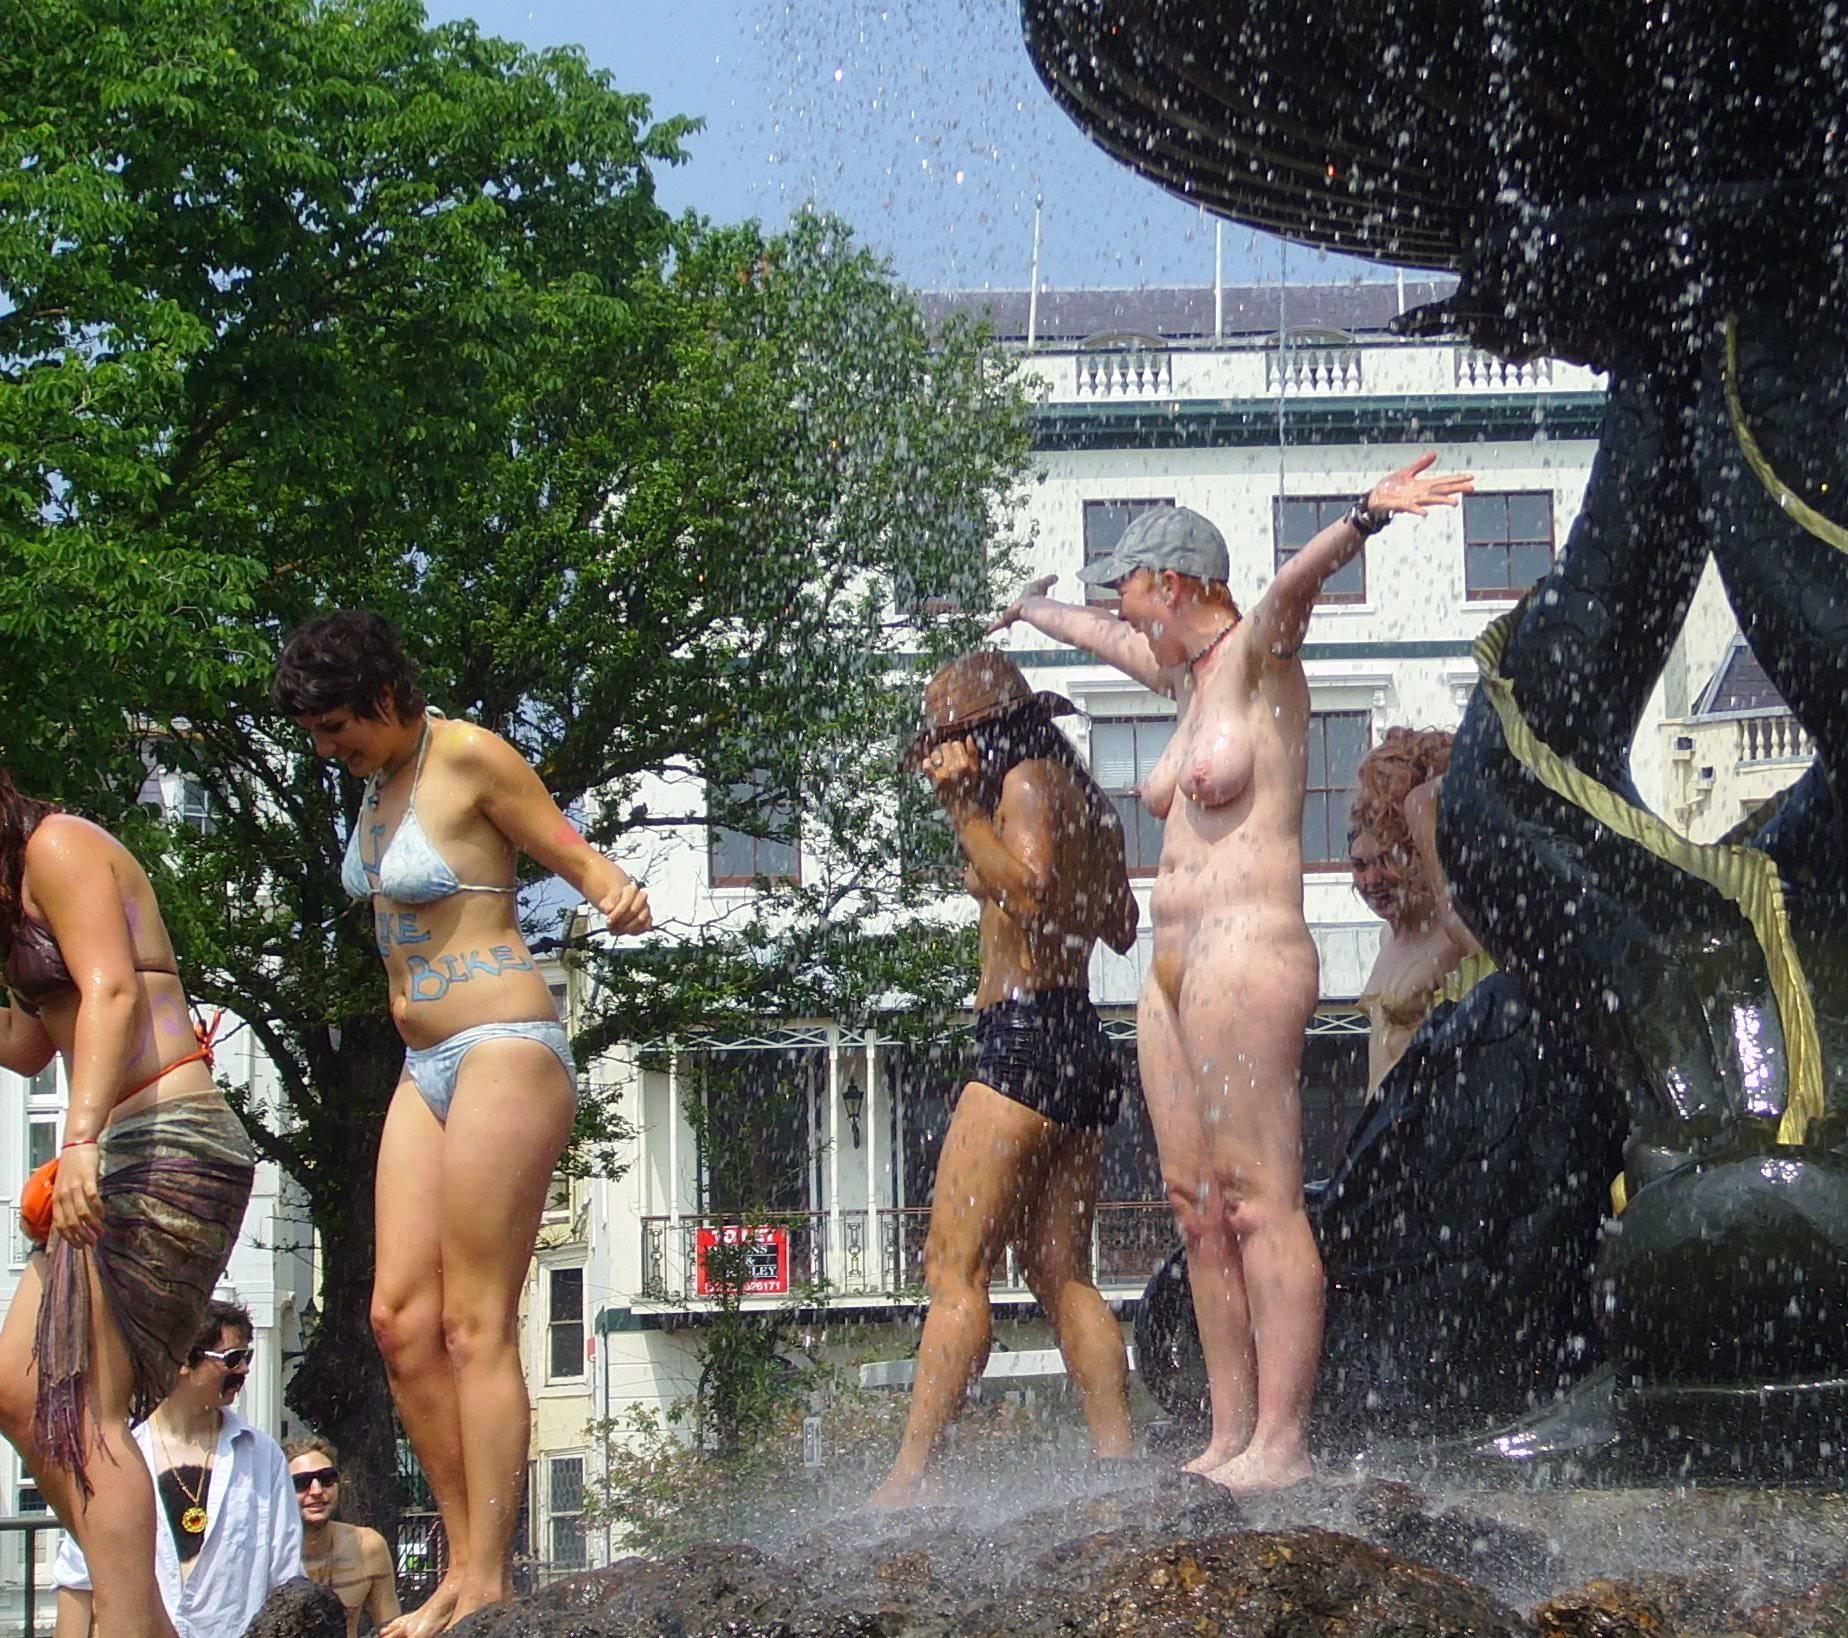 Nudist Pics World Naked Bike Ride [WNBR] UK 2011 - 2